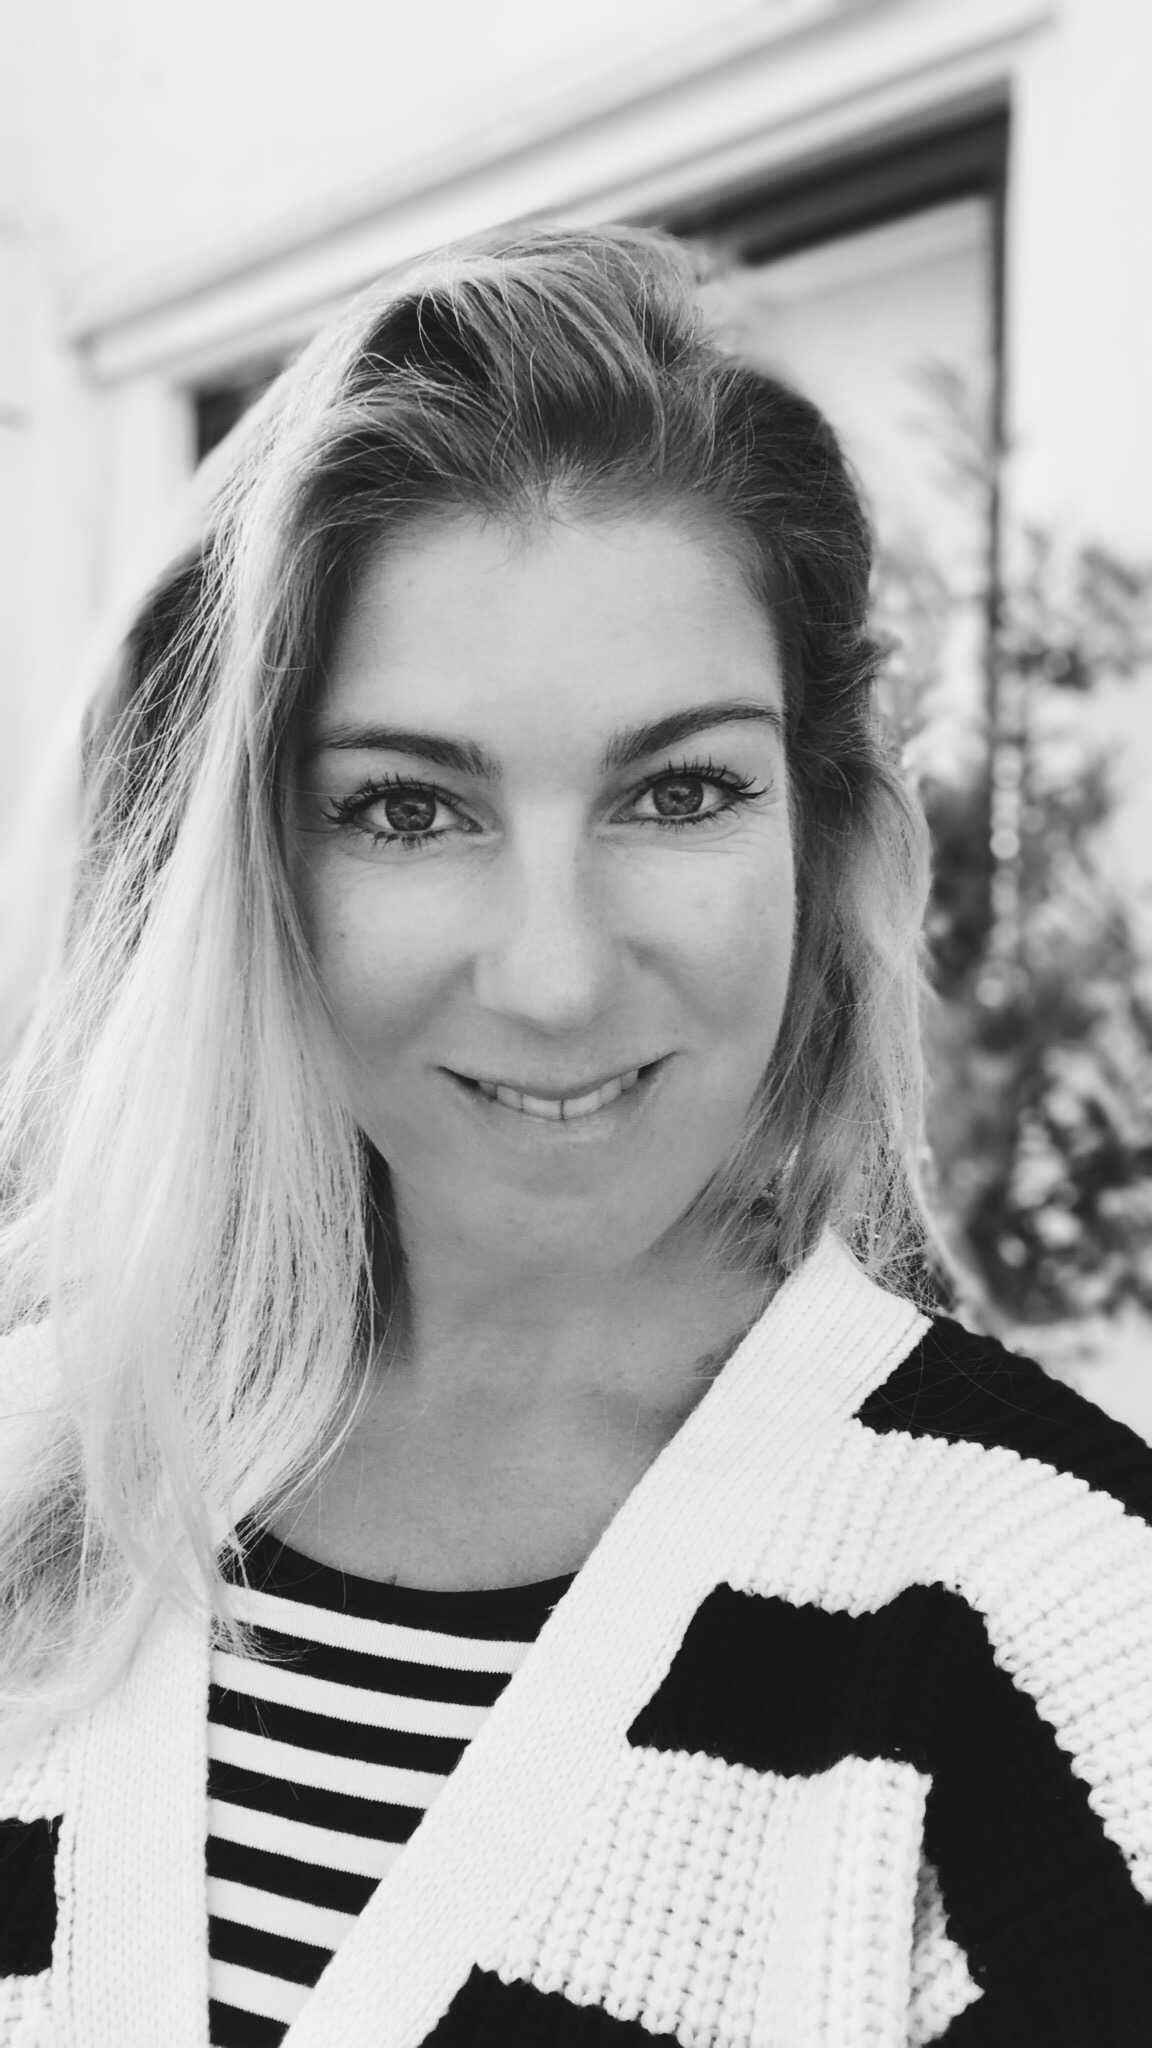 Visualbird about Tamara Muller